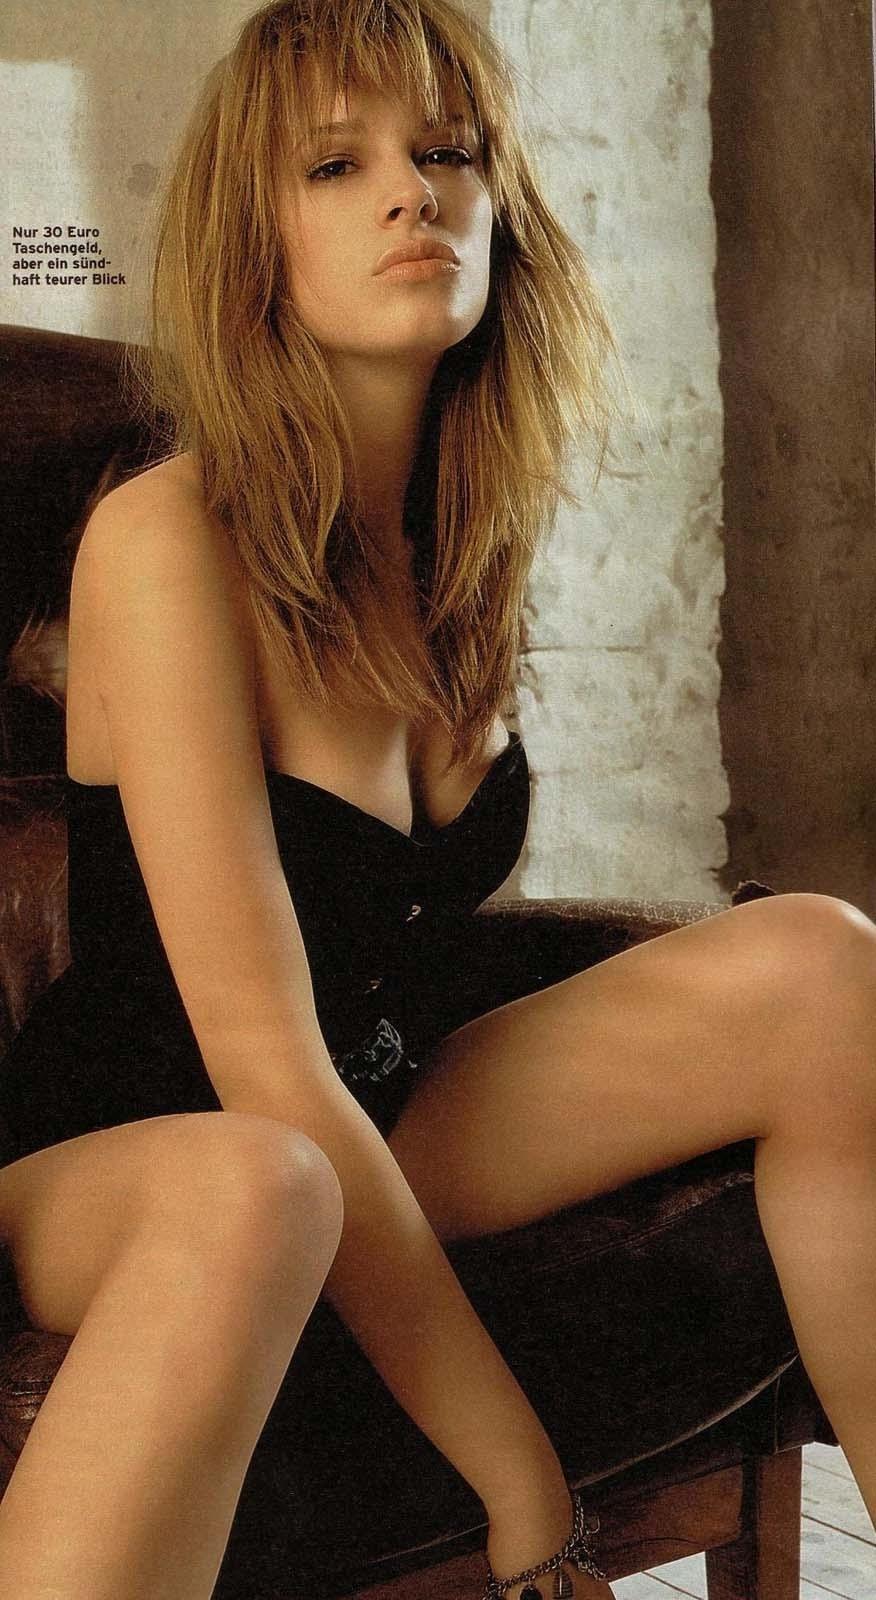 Ивонн Шрёдер голая. Фото - 9